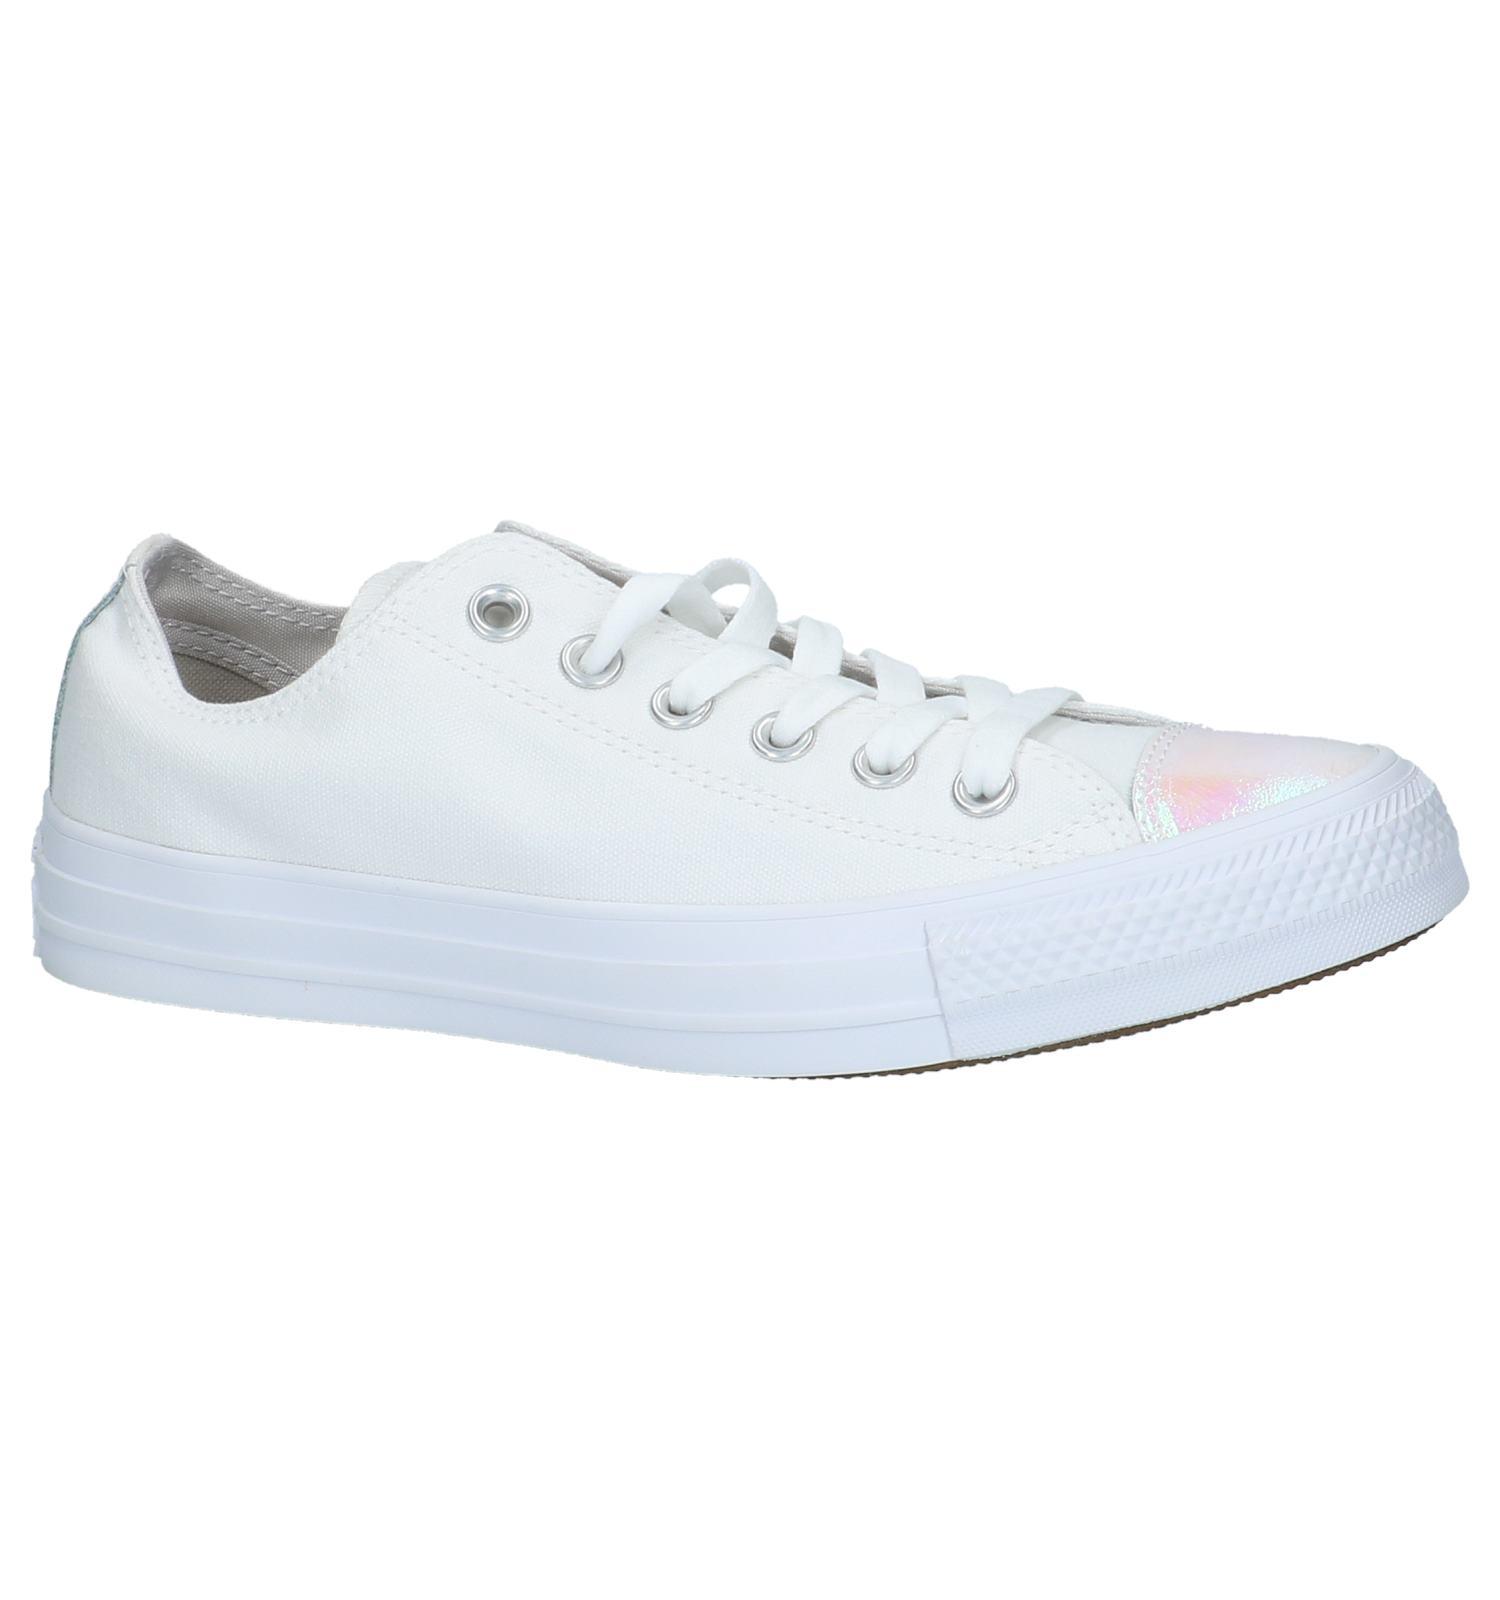 0773b6273c9 Witte Lage Sneakers Converse Chuck Taylor All Star Ox | TORFS.BE | Gratis  verzend en retour